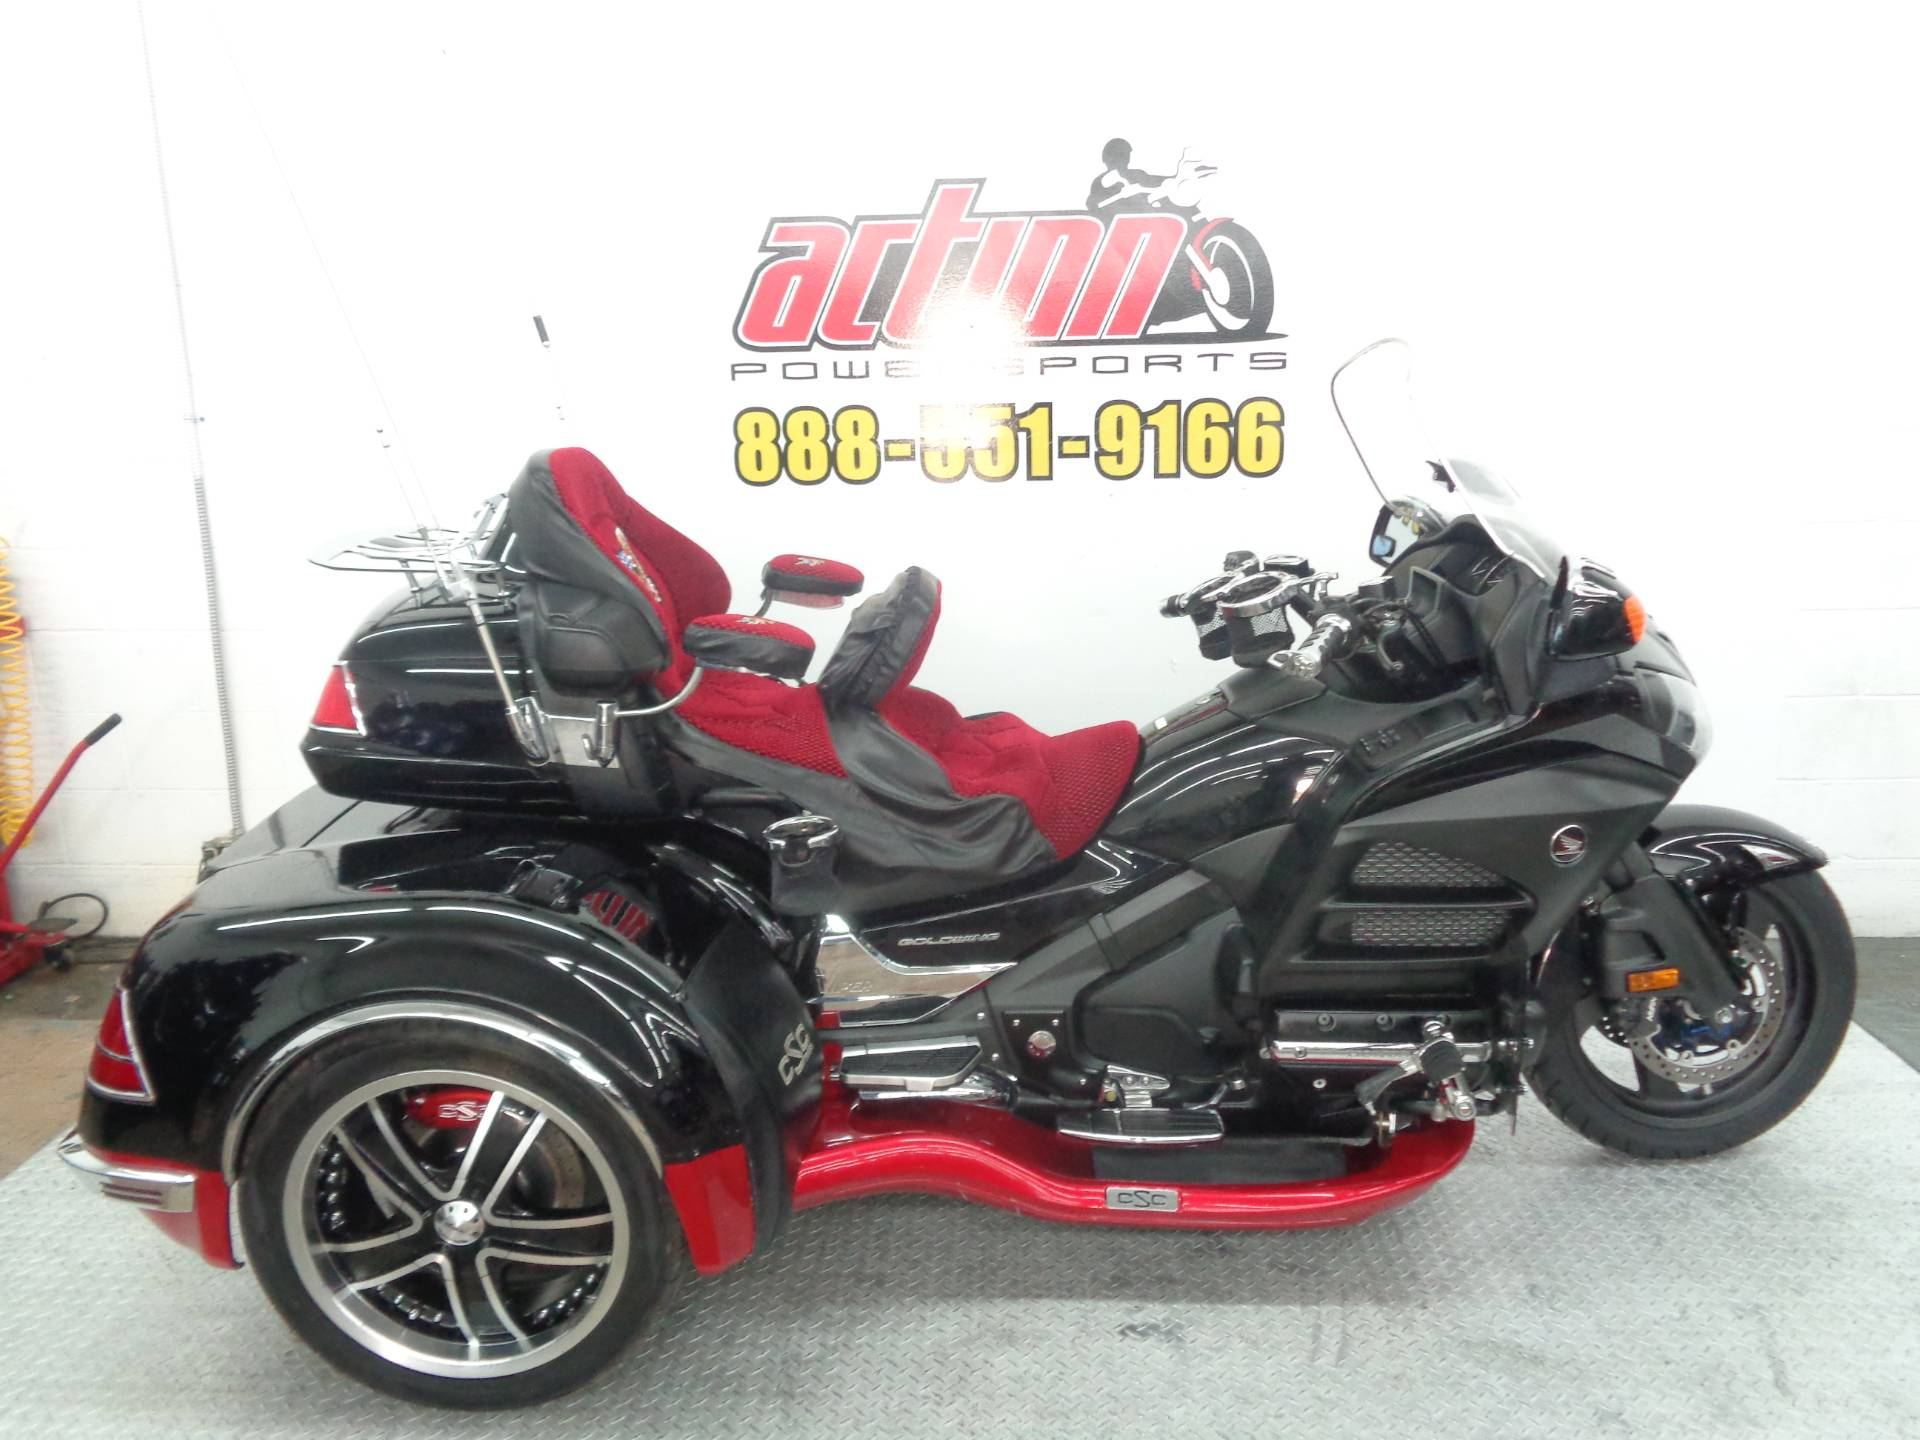 Honda Of Tulsa >> Used 2014 Honda Goldwing Trike Motorcycles In Tulsa Ok Stock